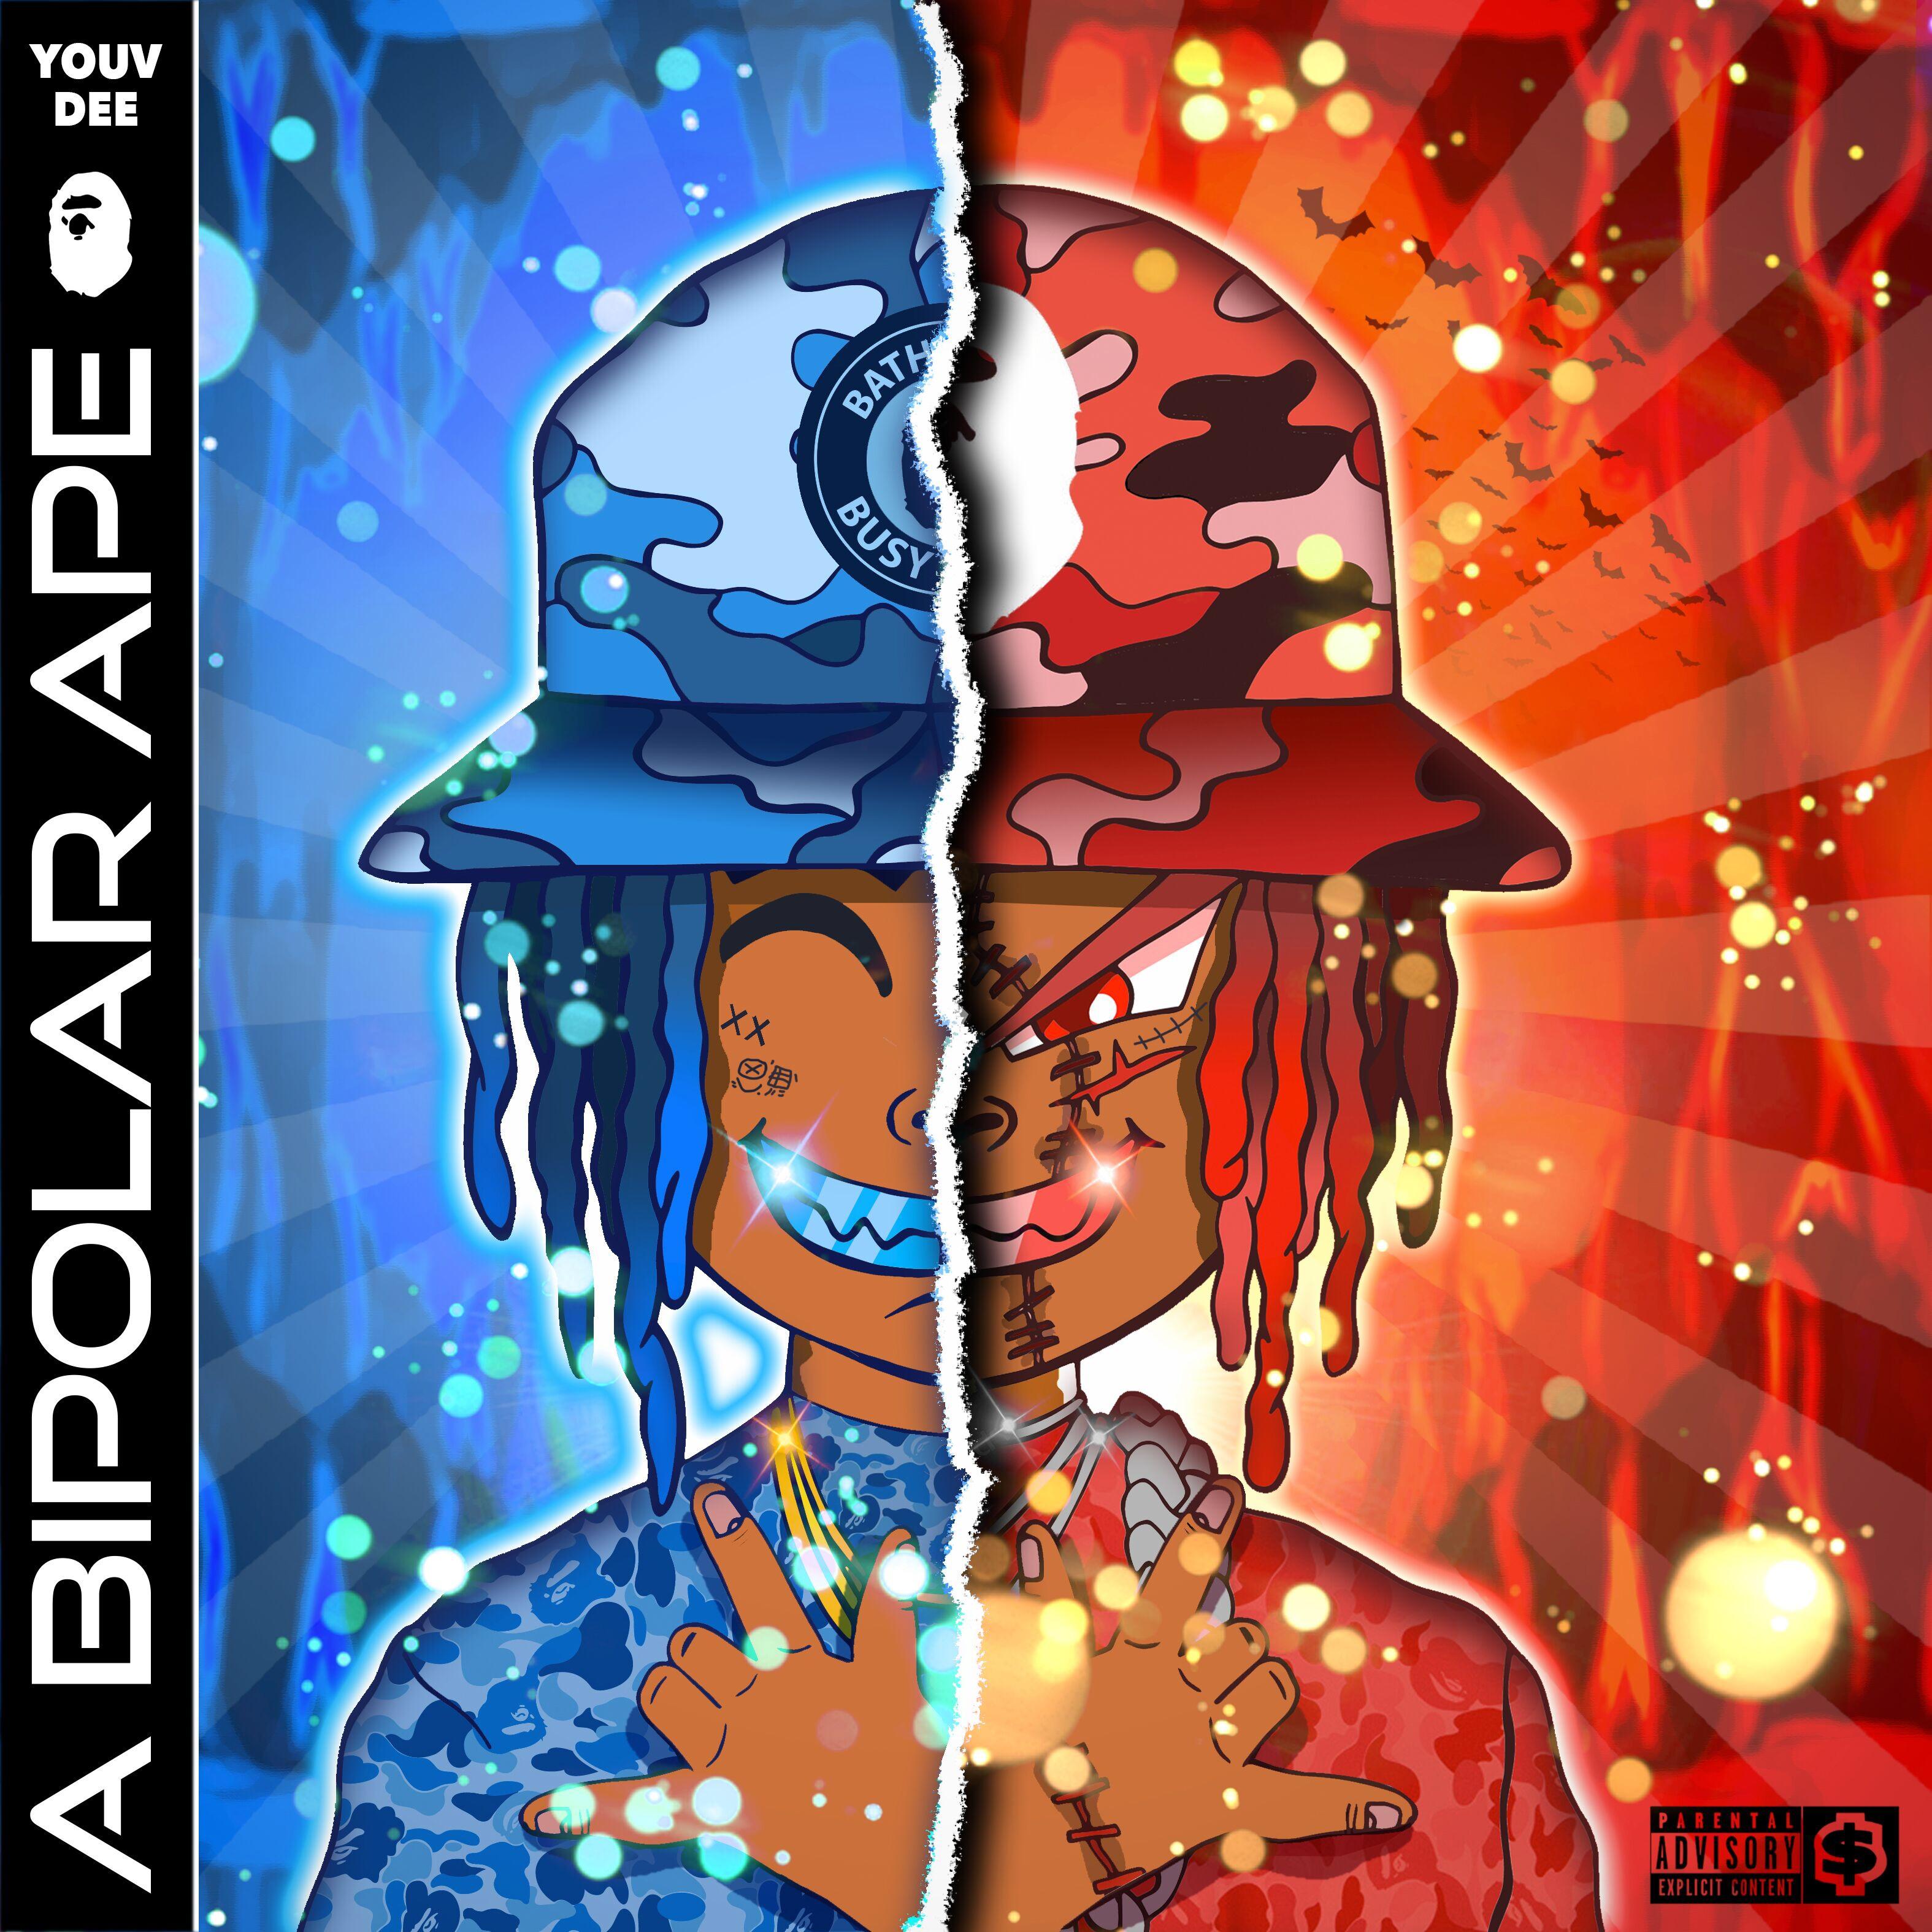 Youv_Dee-Bipolar_ape